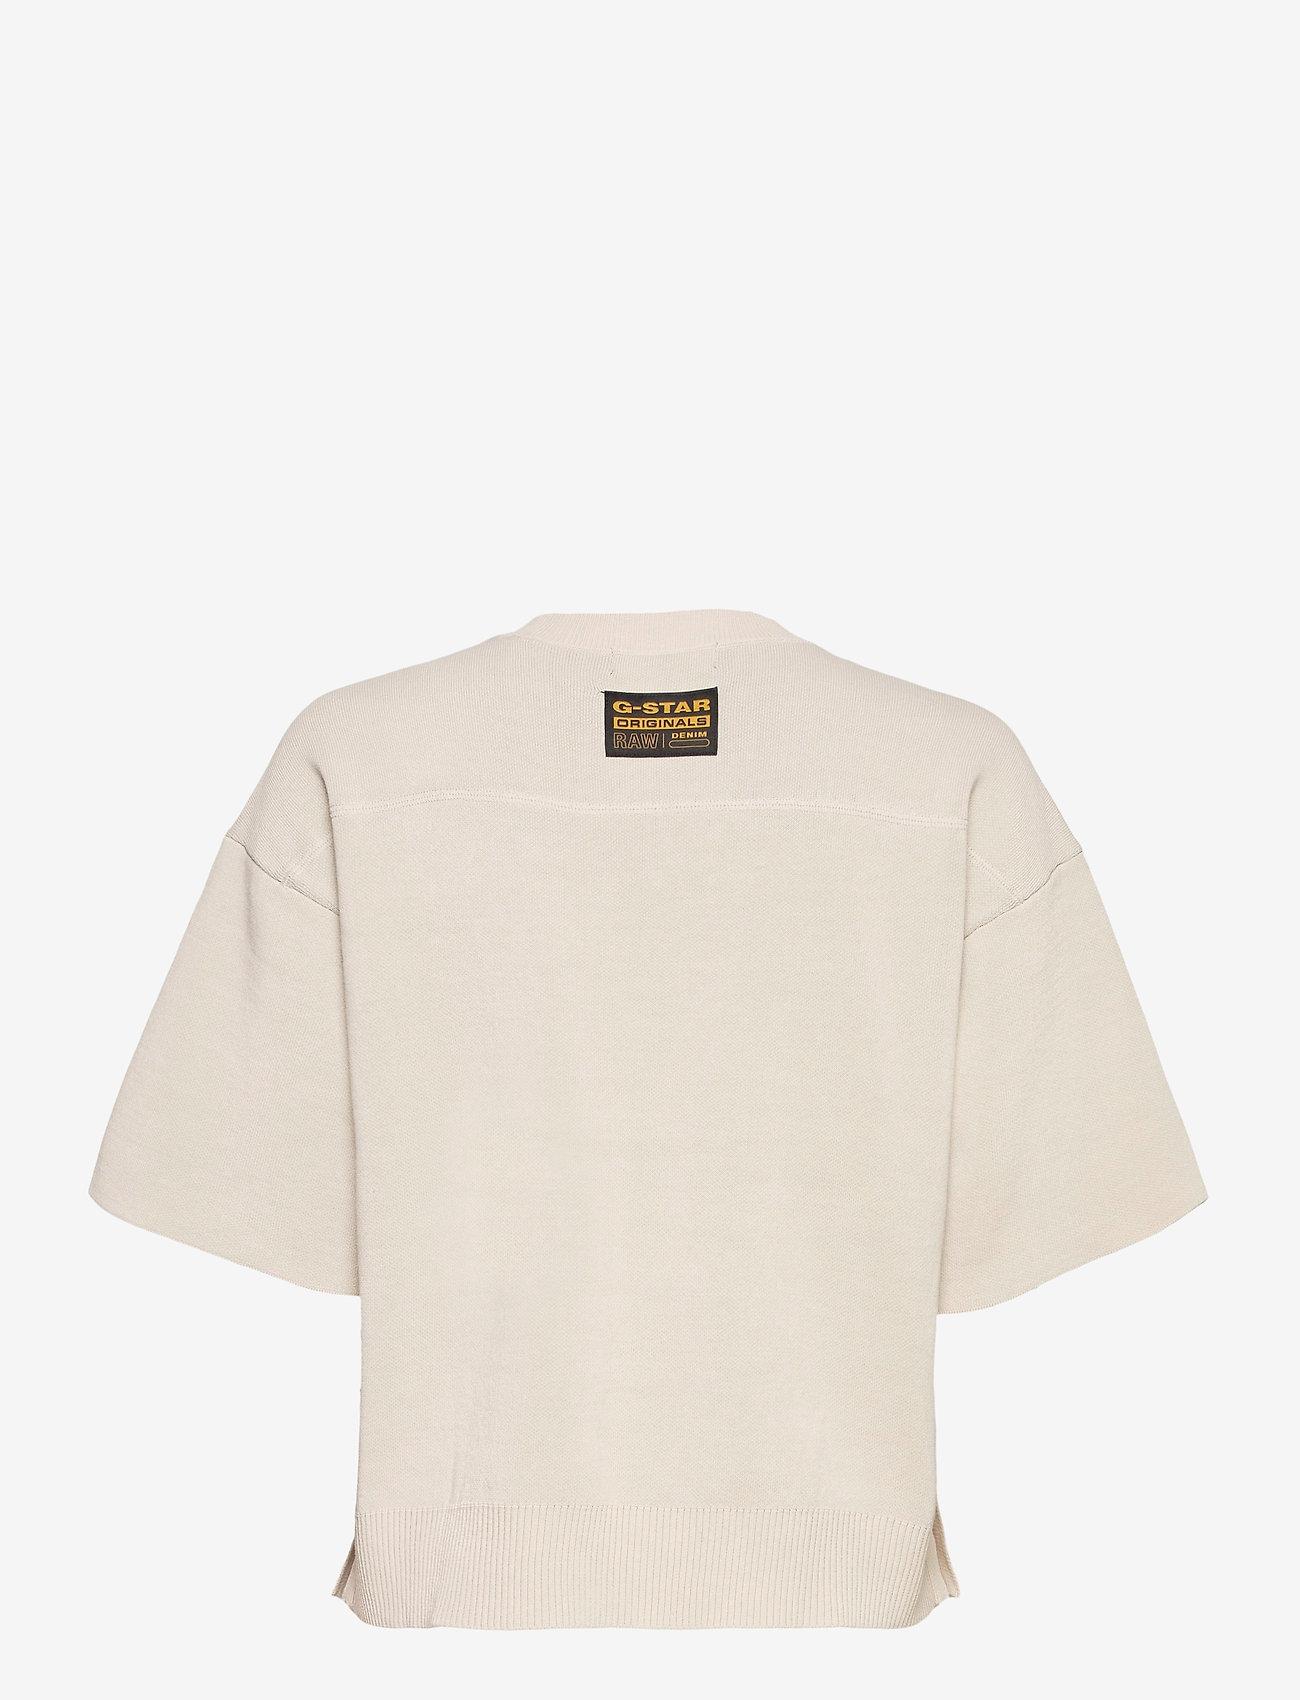 G-star RAW - Knitted v-neck tee - gebreide t-shirts - whitebait/carbid - 1